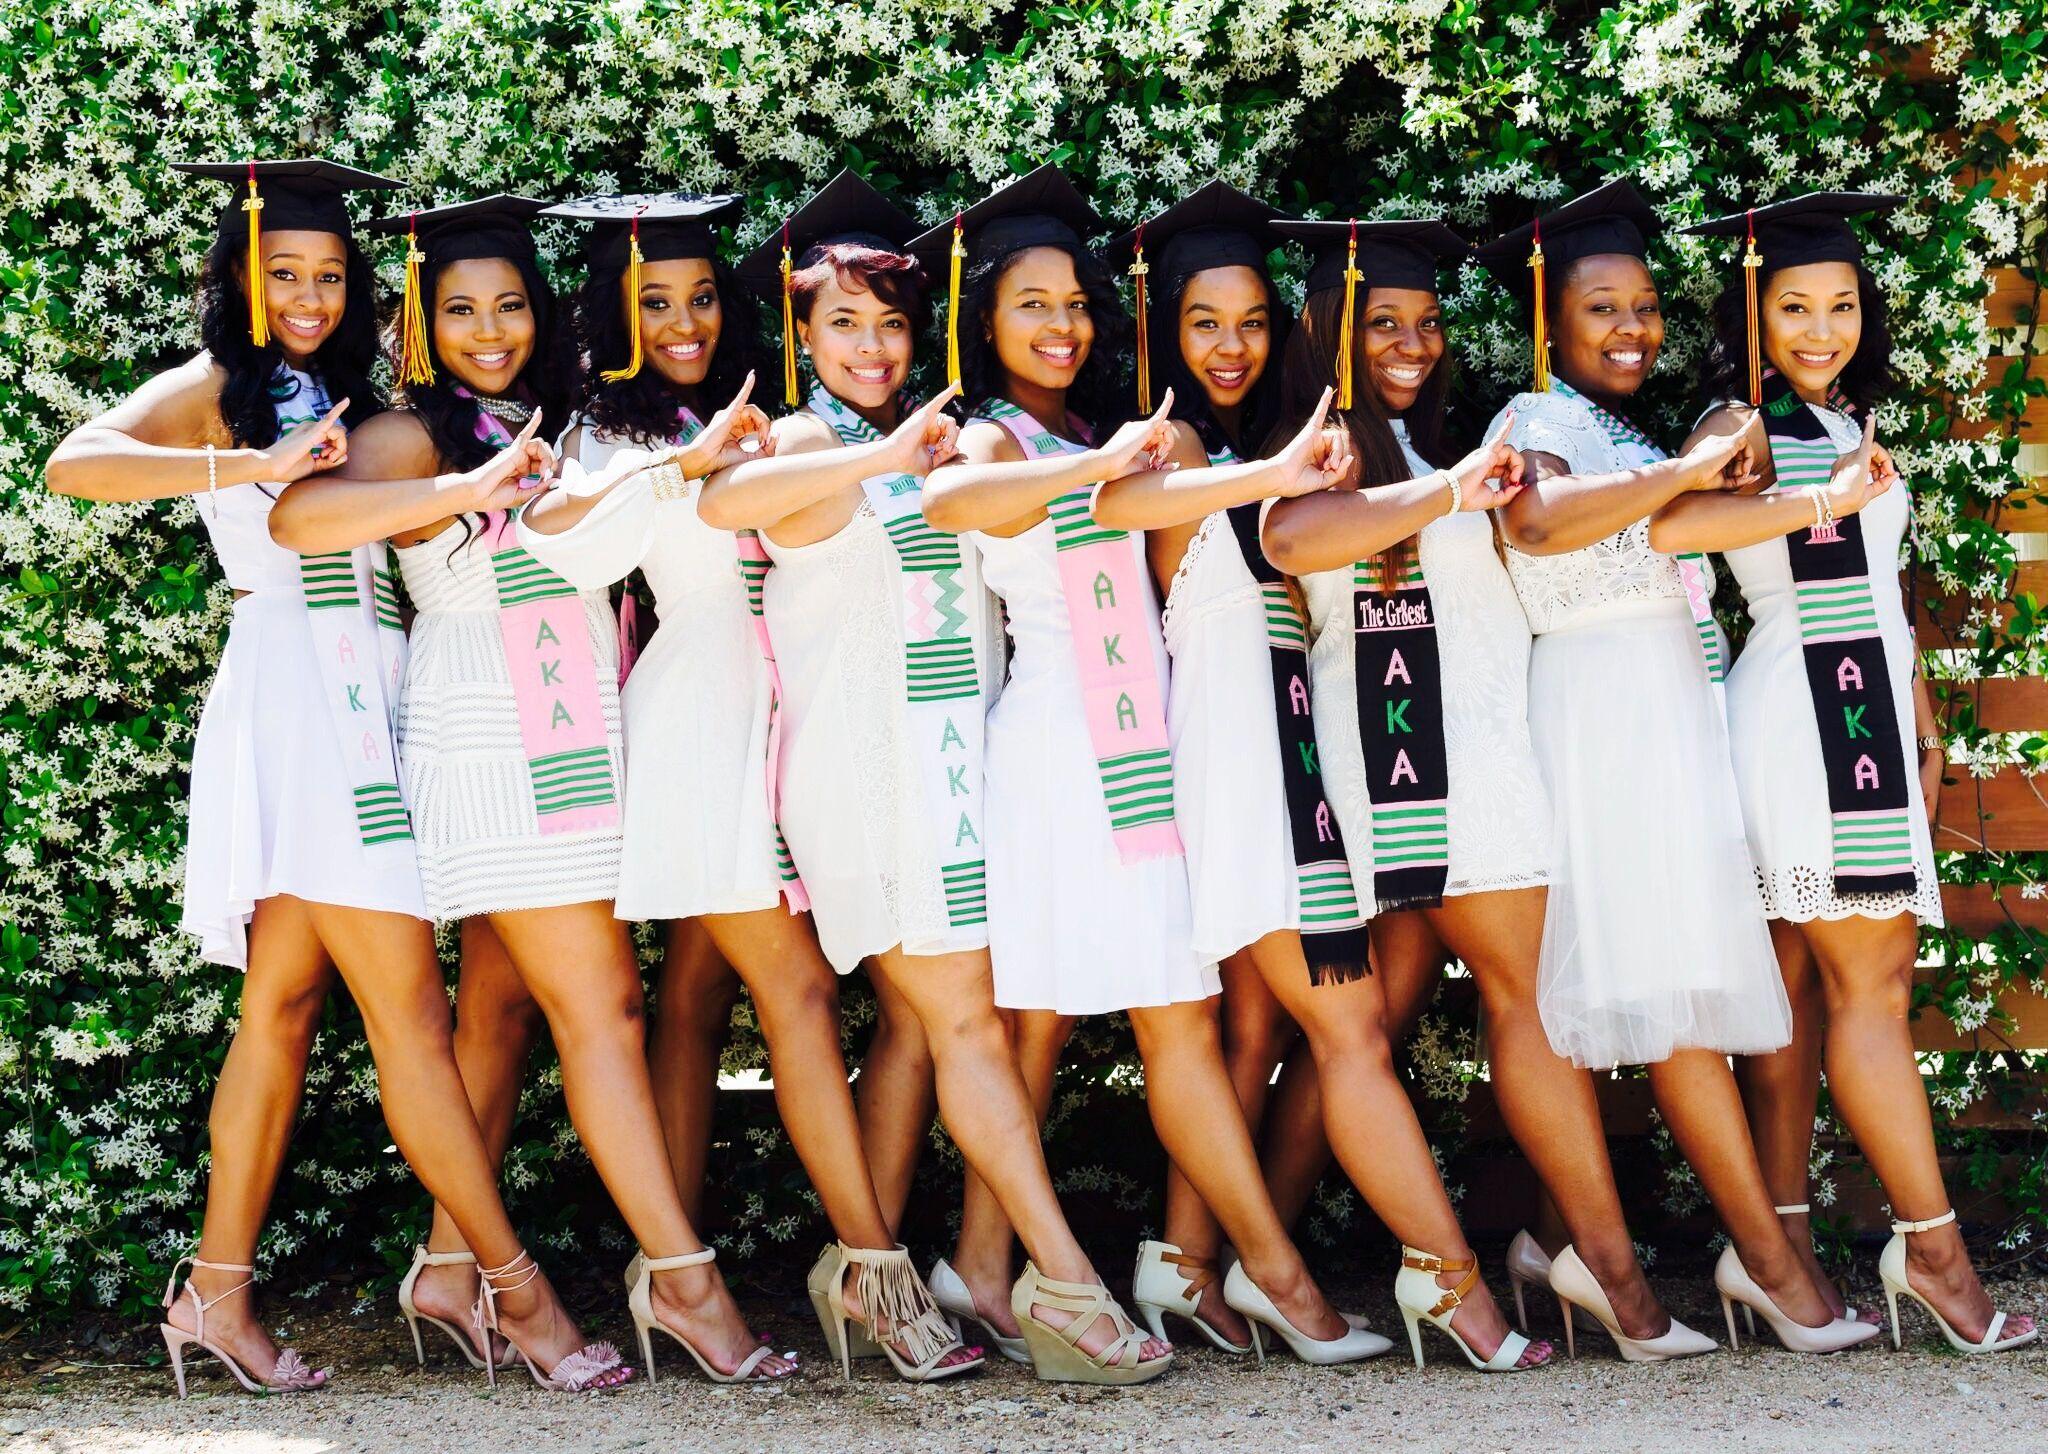 325b60338e14e Texas State University Alpha Kappa Alpha Sorority Incorporated Graduates  Group Picture Ideas #AKA #GraduationPictures #BlackWomen #Graduates  #GroupPictures ...